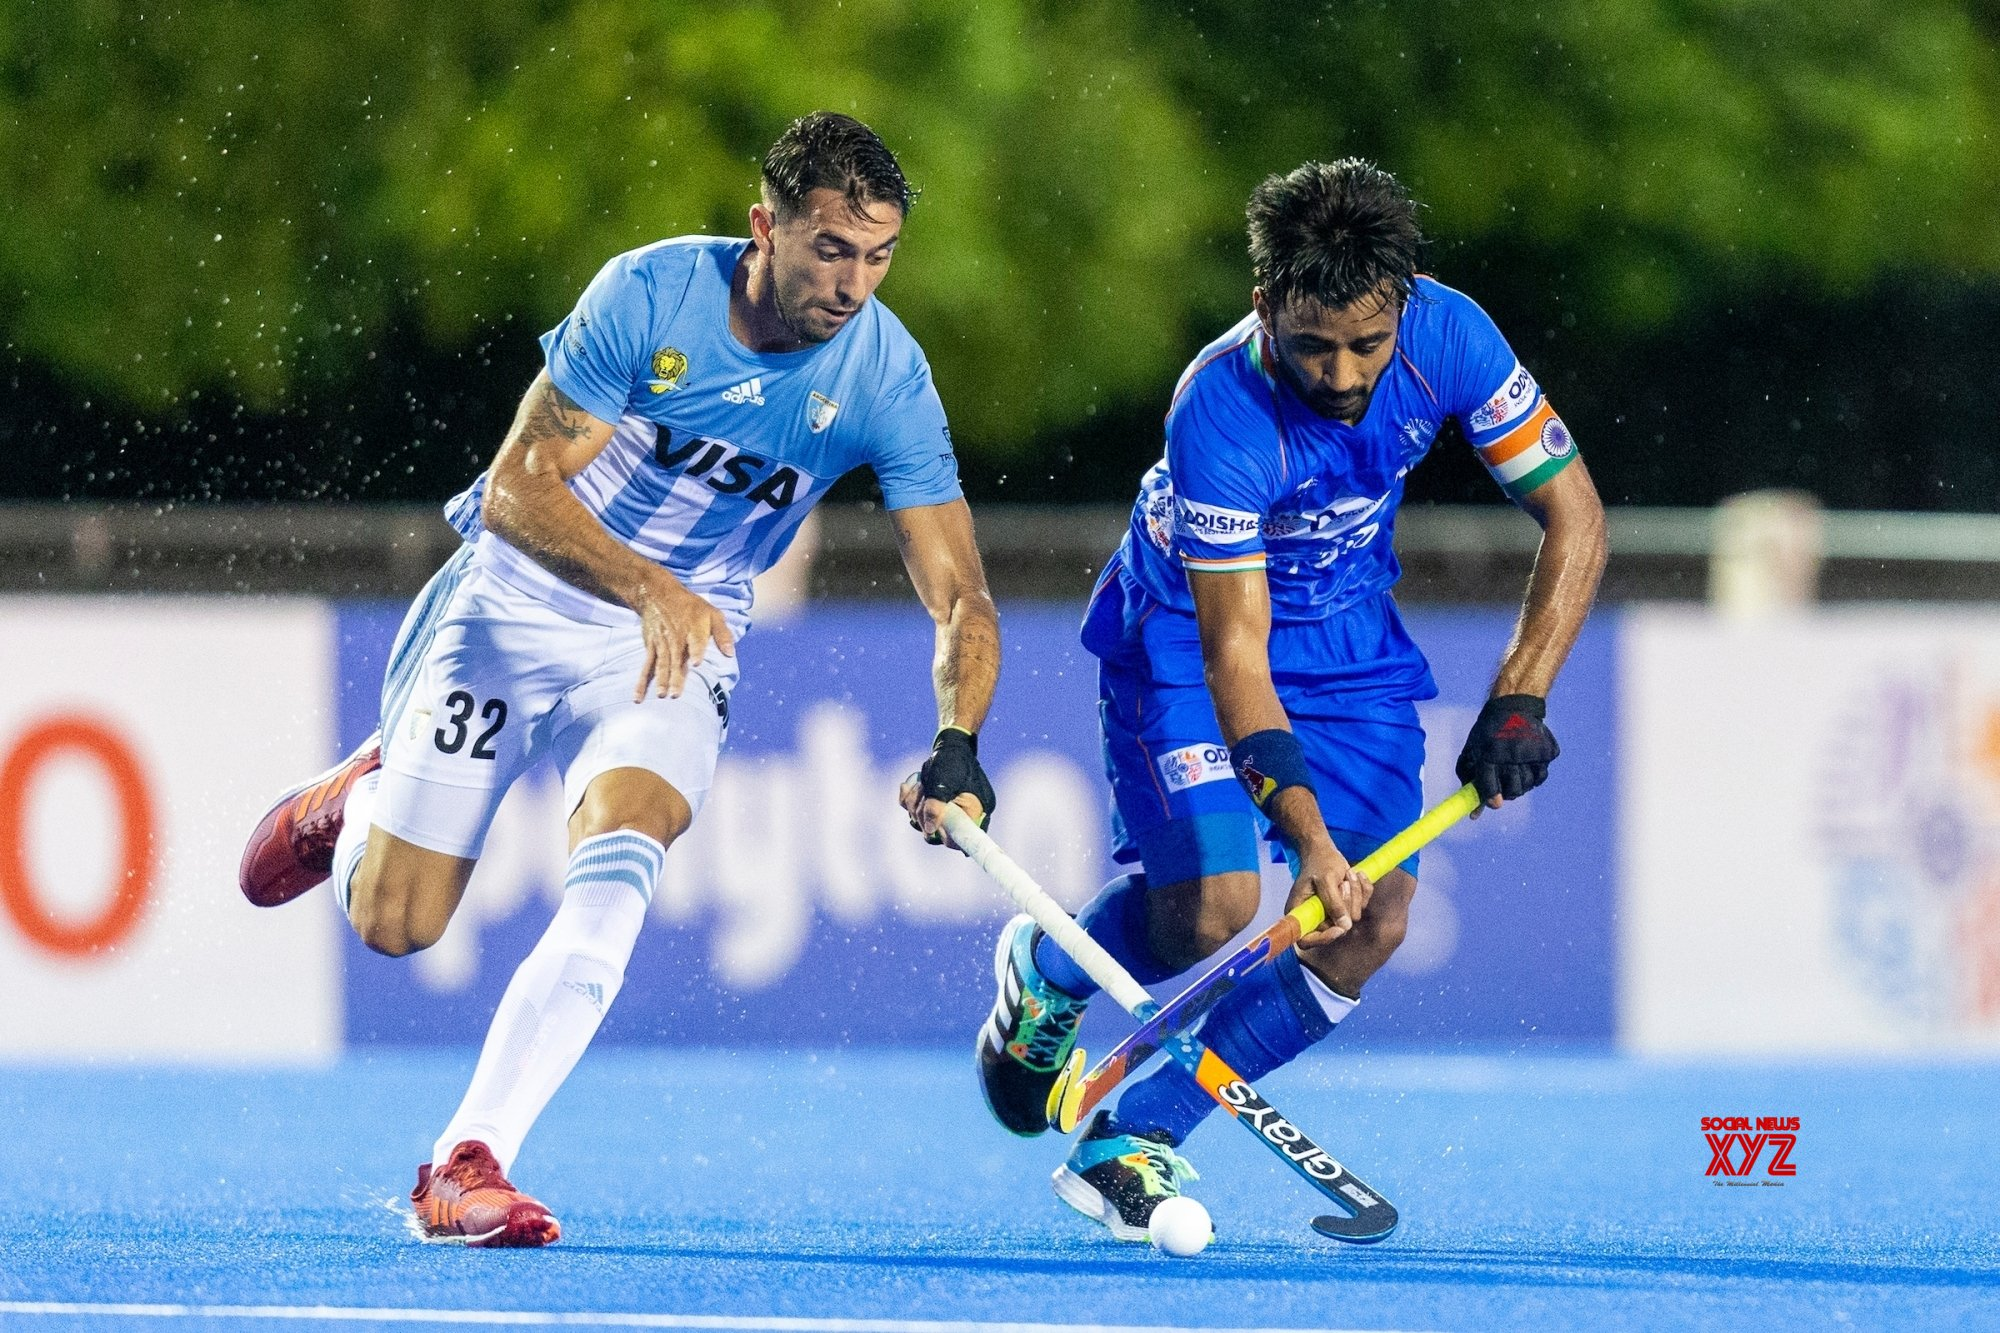 Hockey Pro League: Covid-hit India may not send team to Spain, Germany